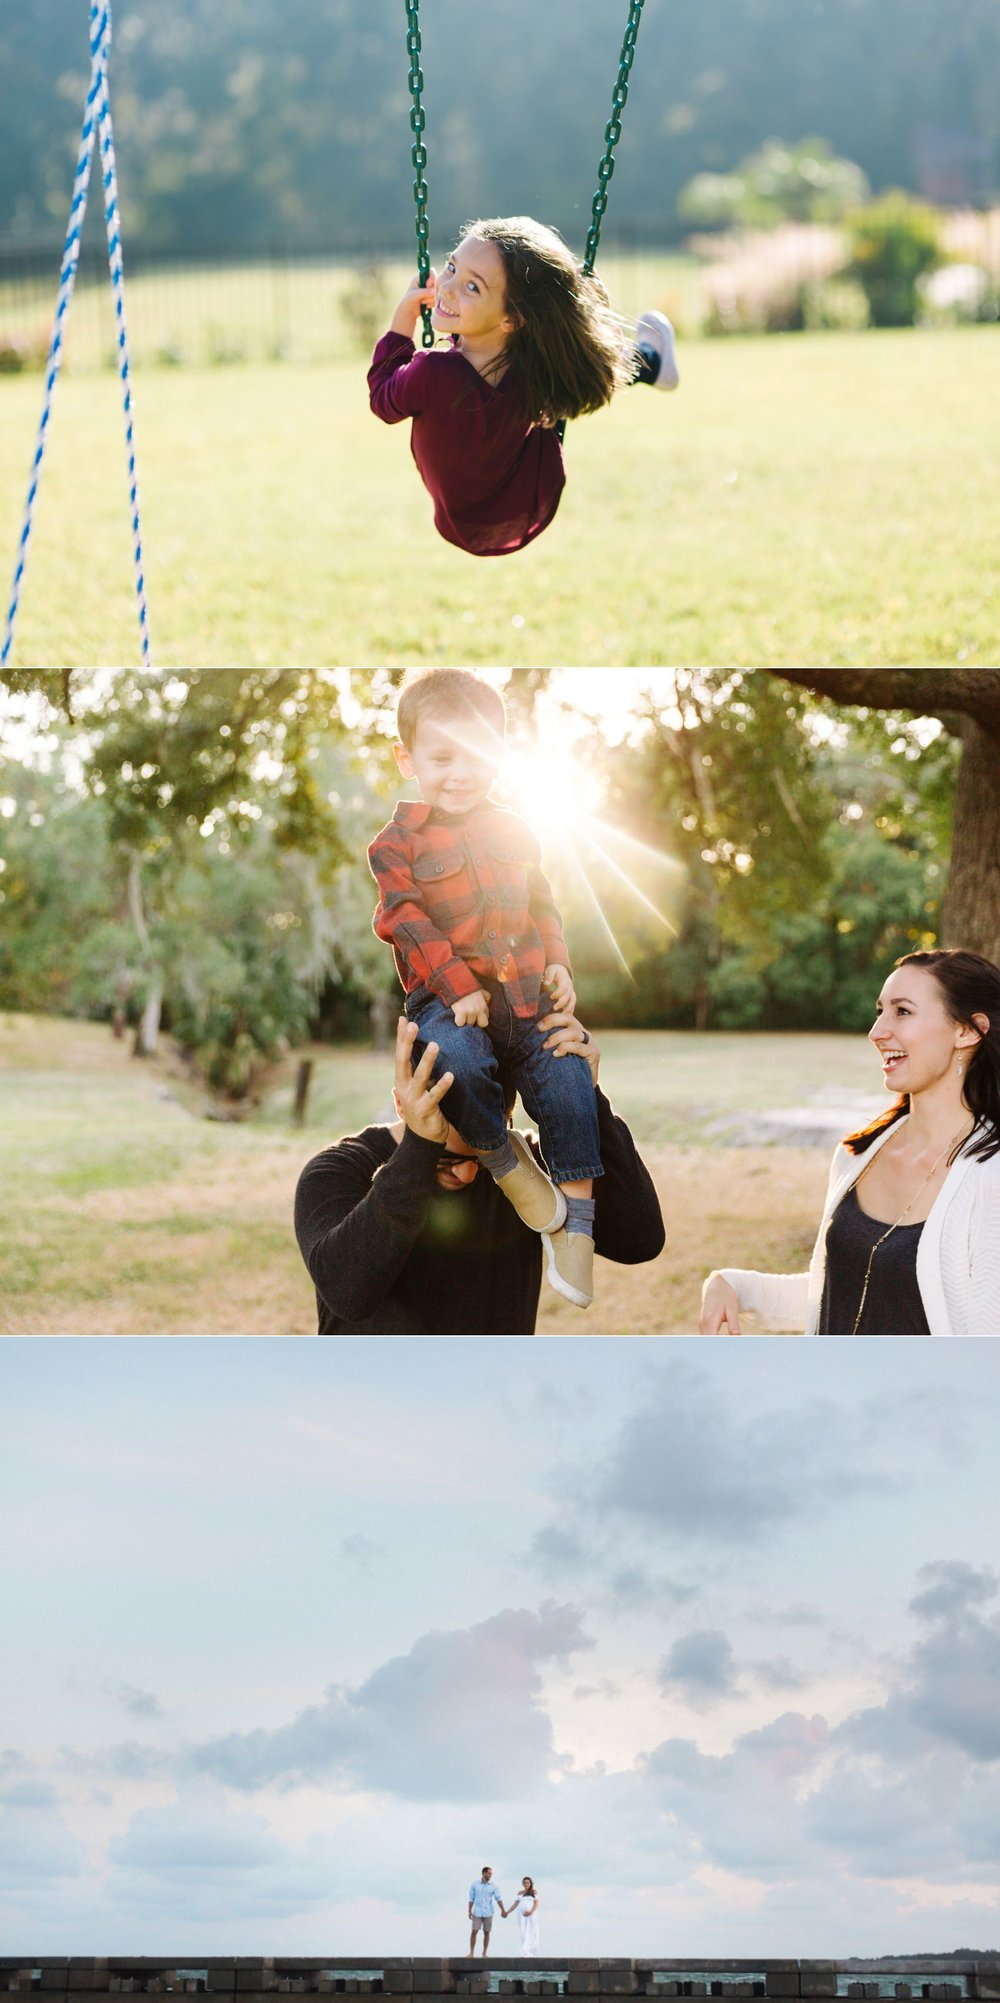 Jake & Katie's Best of Families 2016-028.jpg